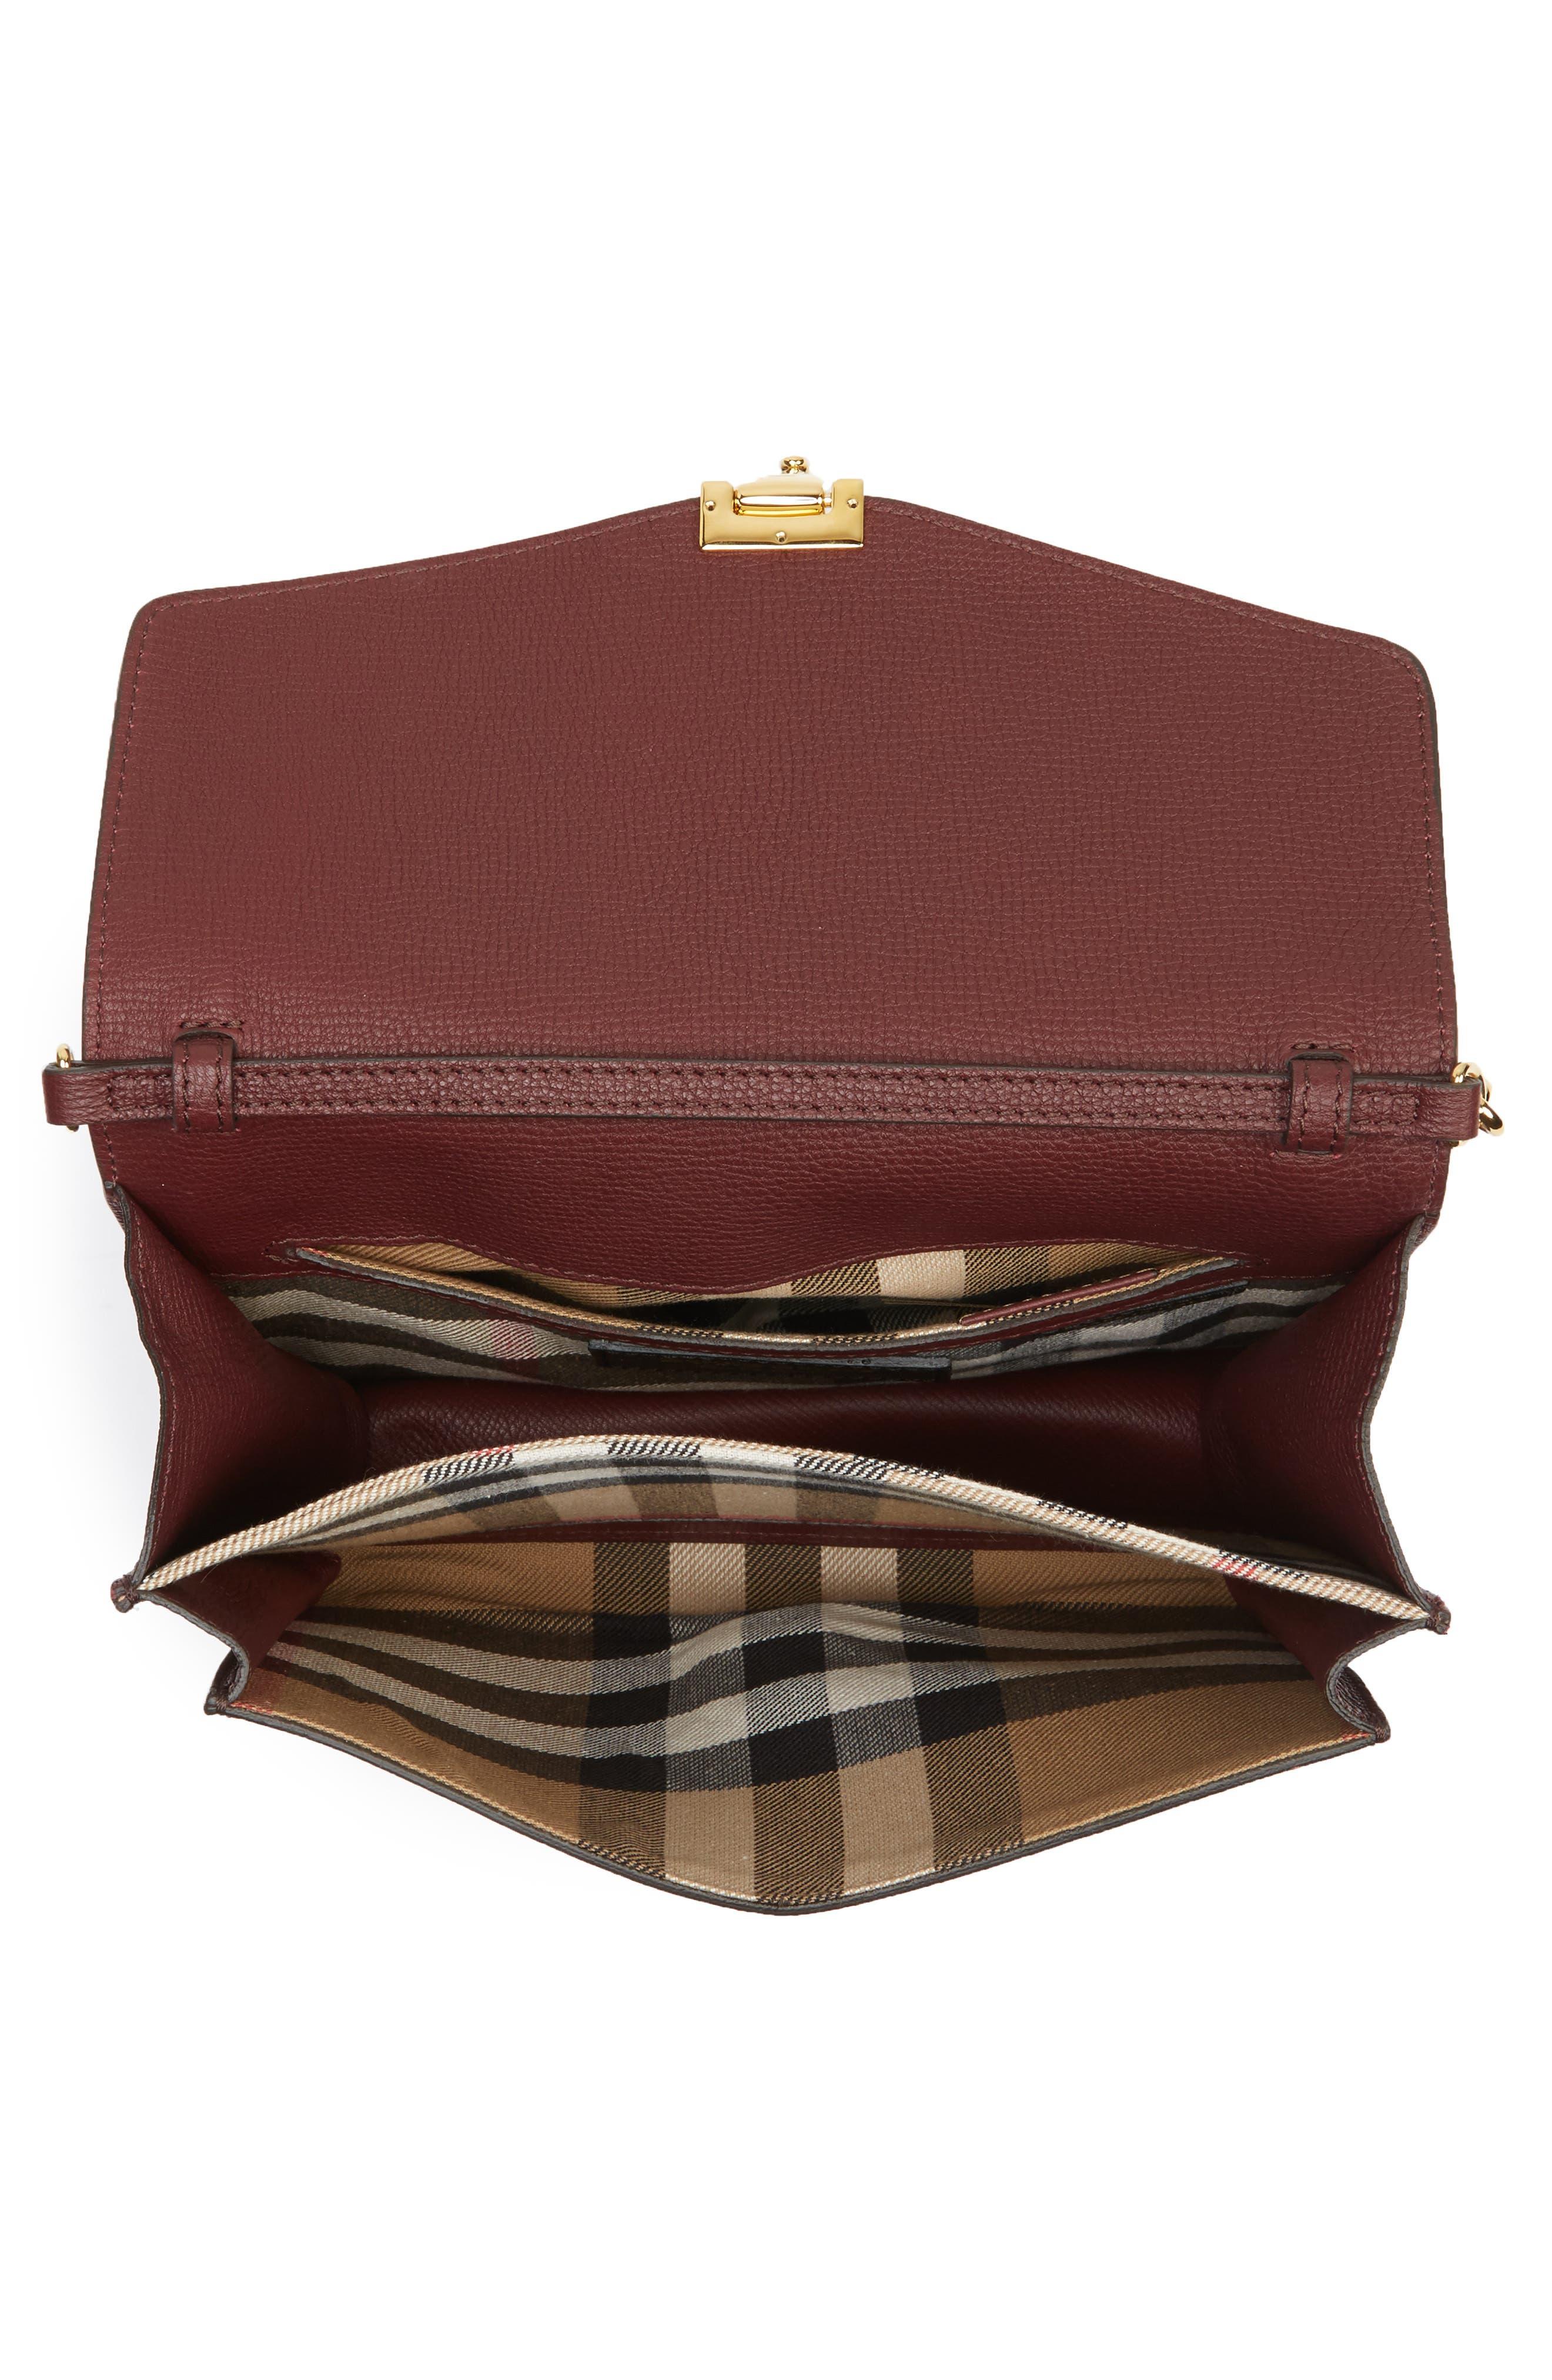 Macken Leather Derby Crossbody Bag,                             Alternate thumbnail 4, color,                             606